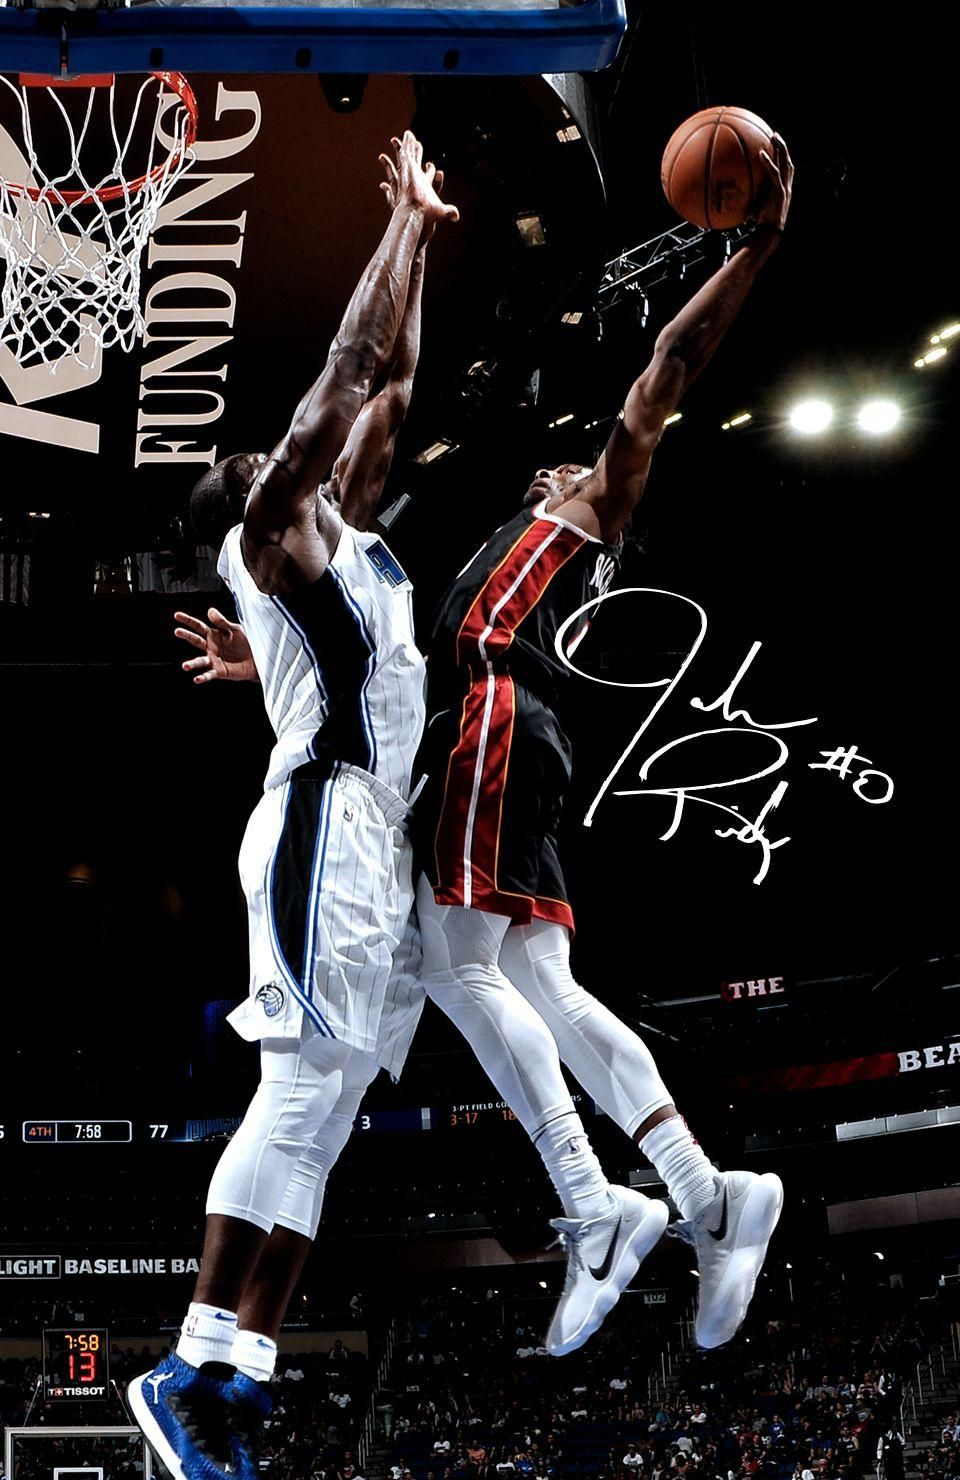 Miami Heat Wallpaper In 2020 Sports Basketball Nike Wallpaper Nba Basketball